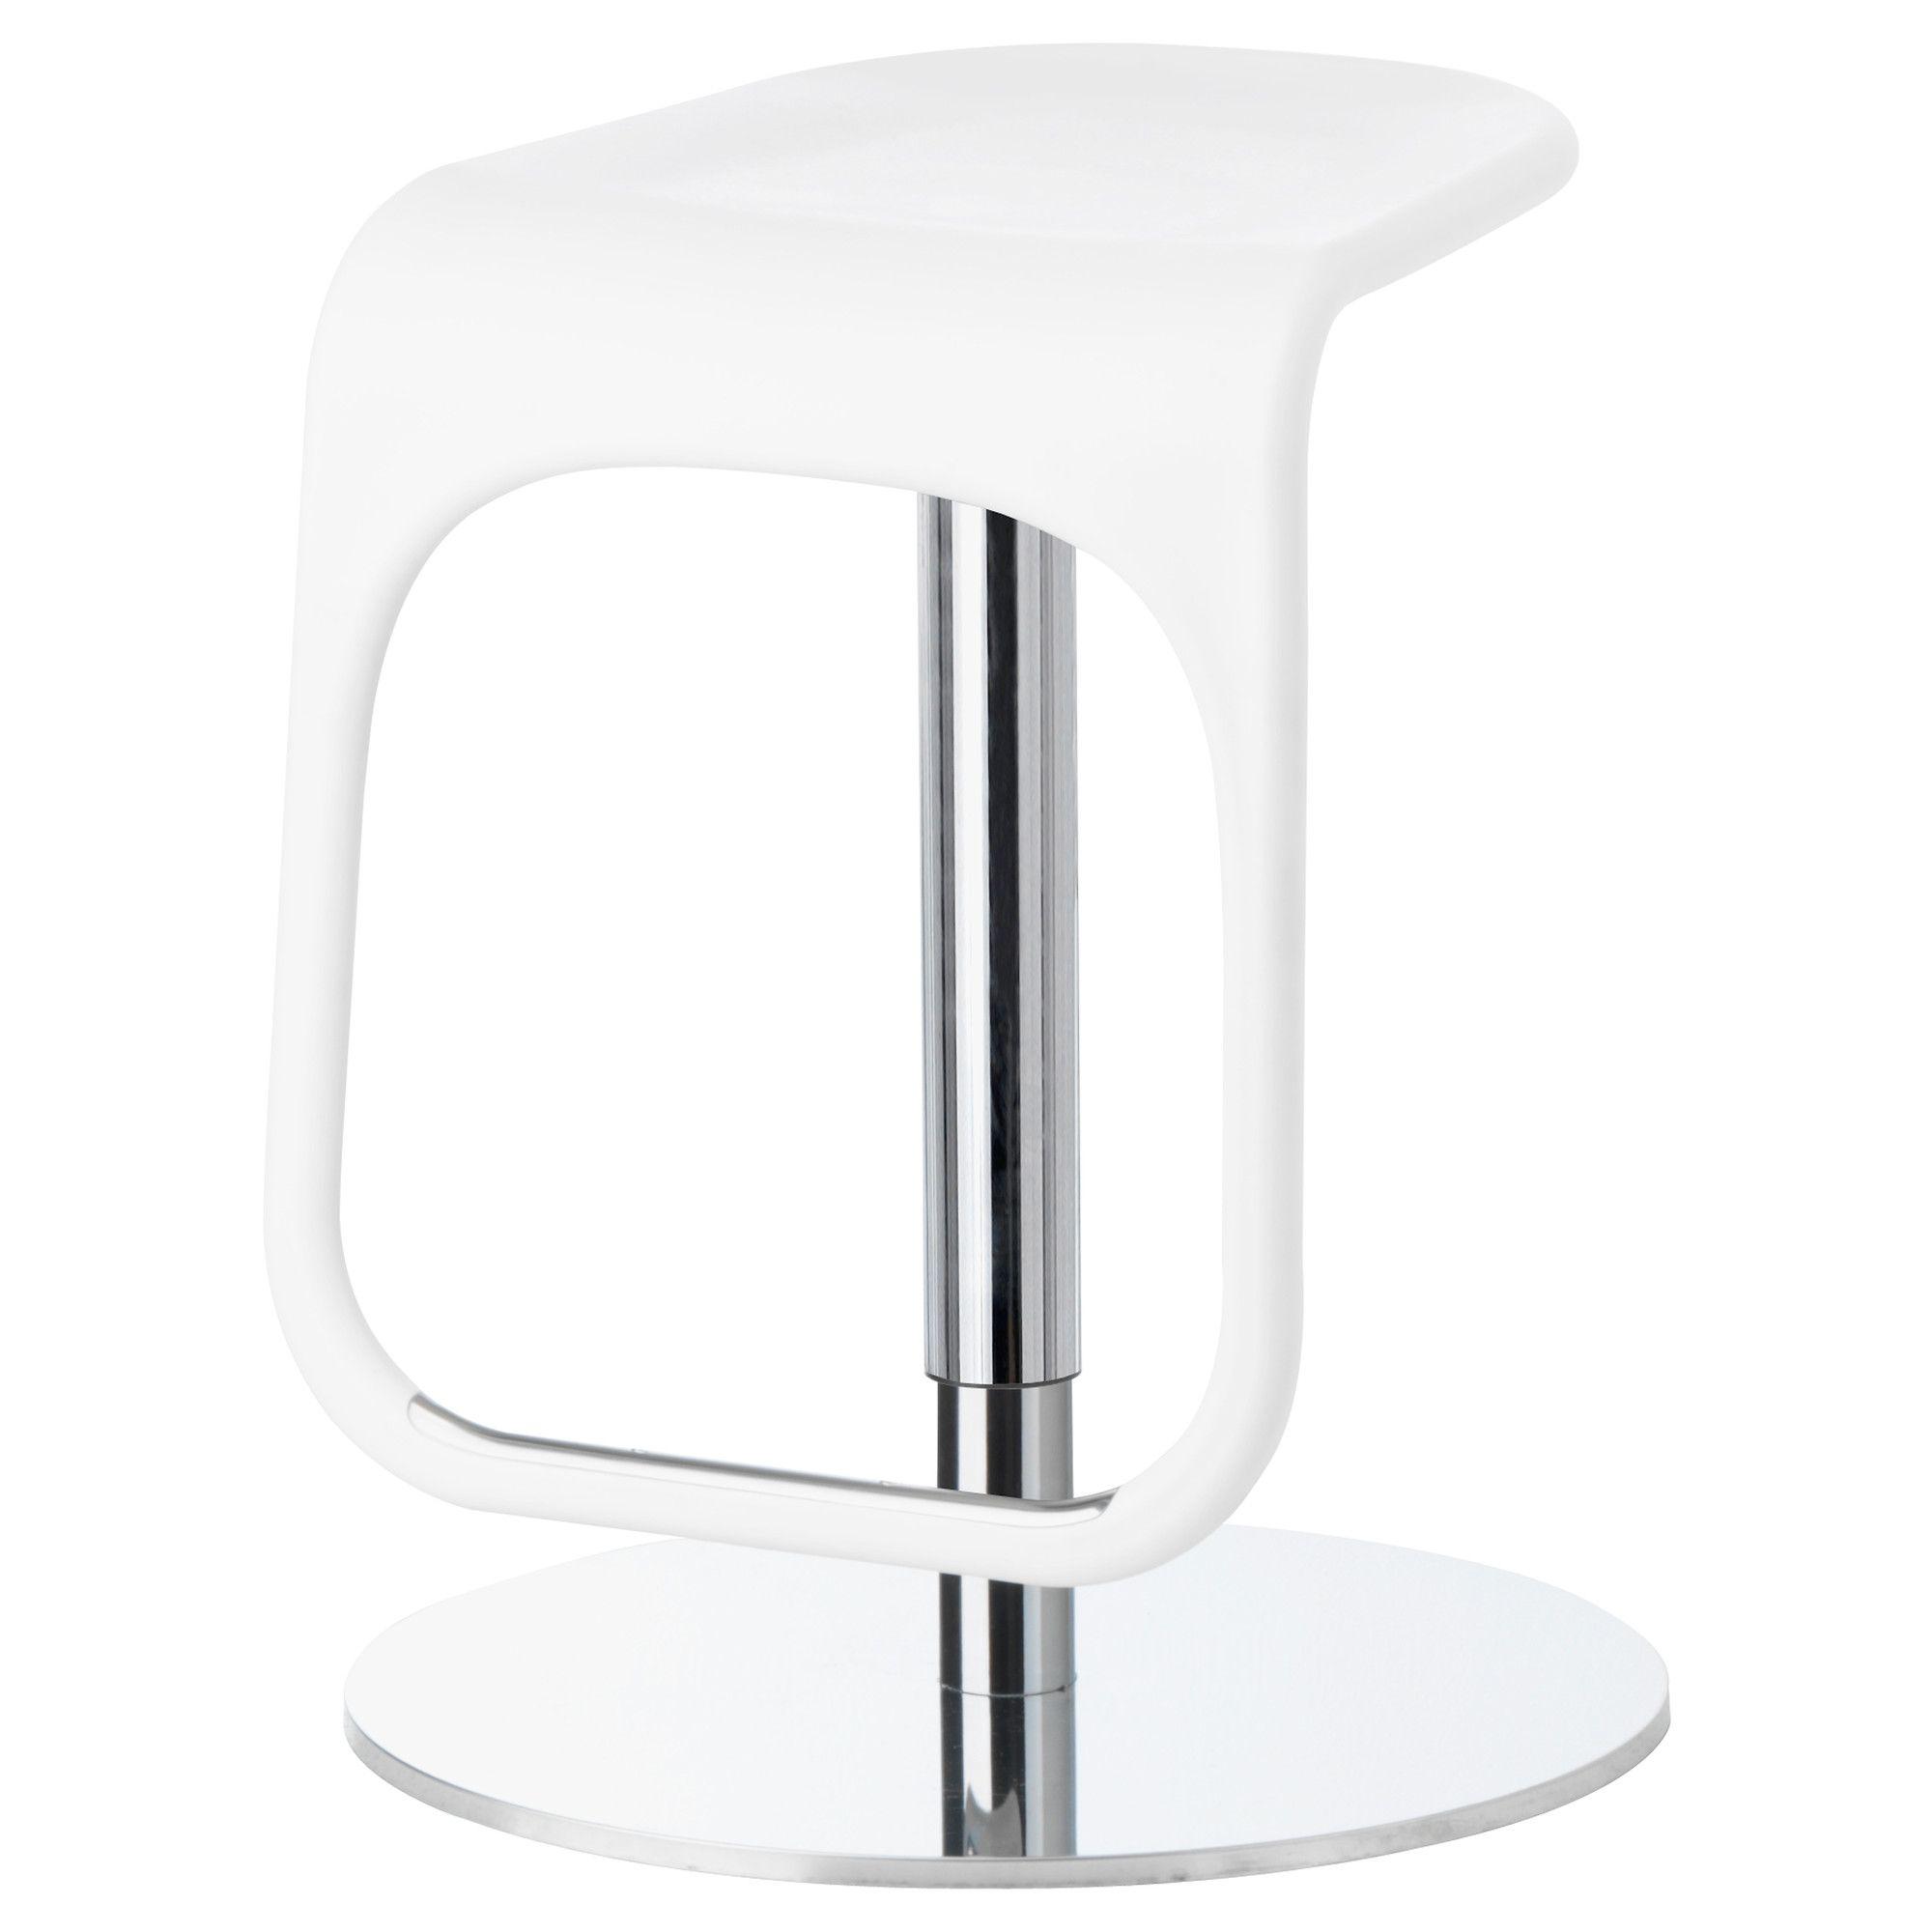 Ikea Us Furniture And Home Furnishings Ikea Barstools Bar